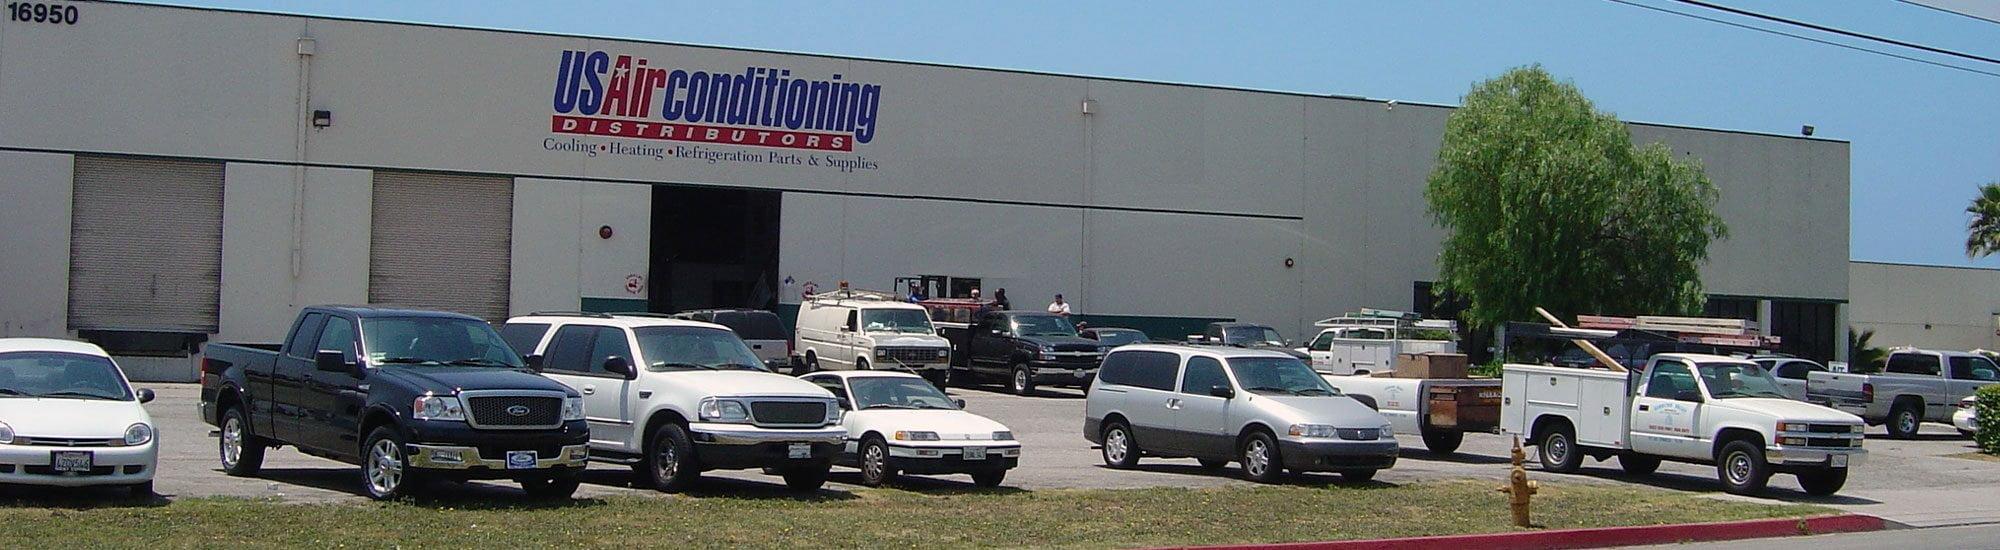 Us Air Conditioning Distributors California Arizona Nevada